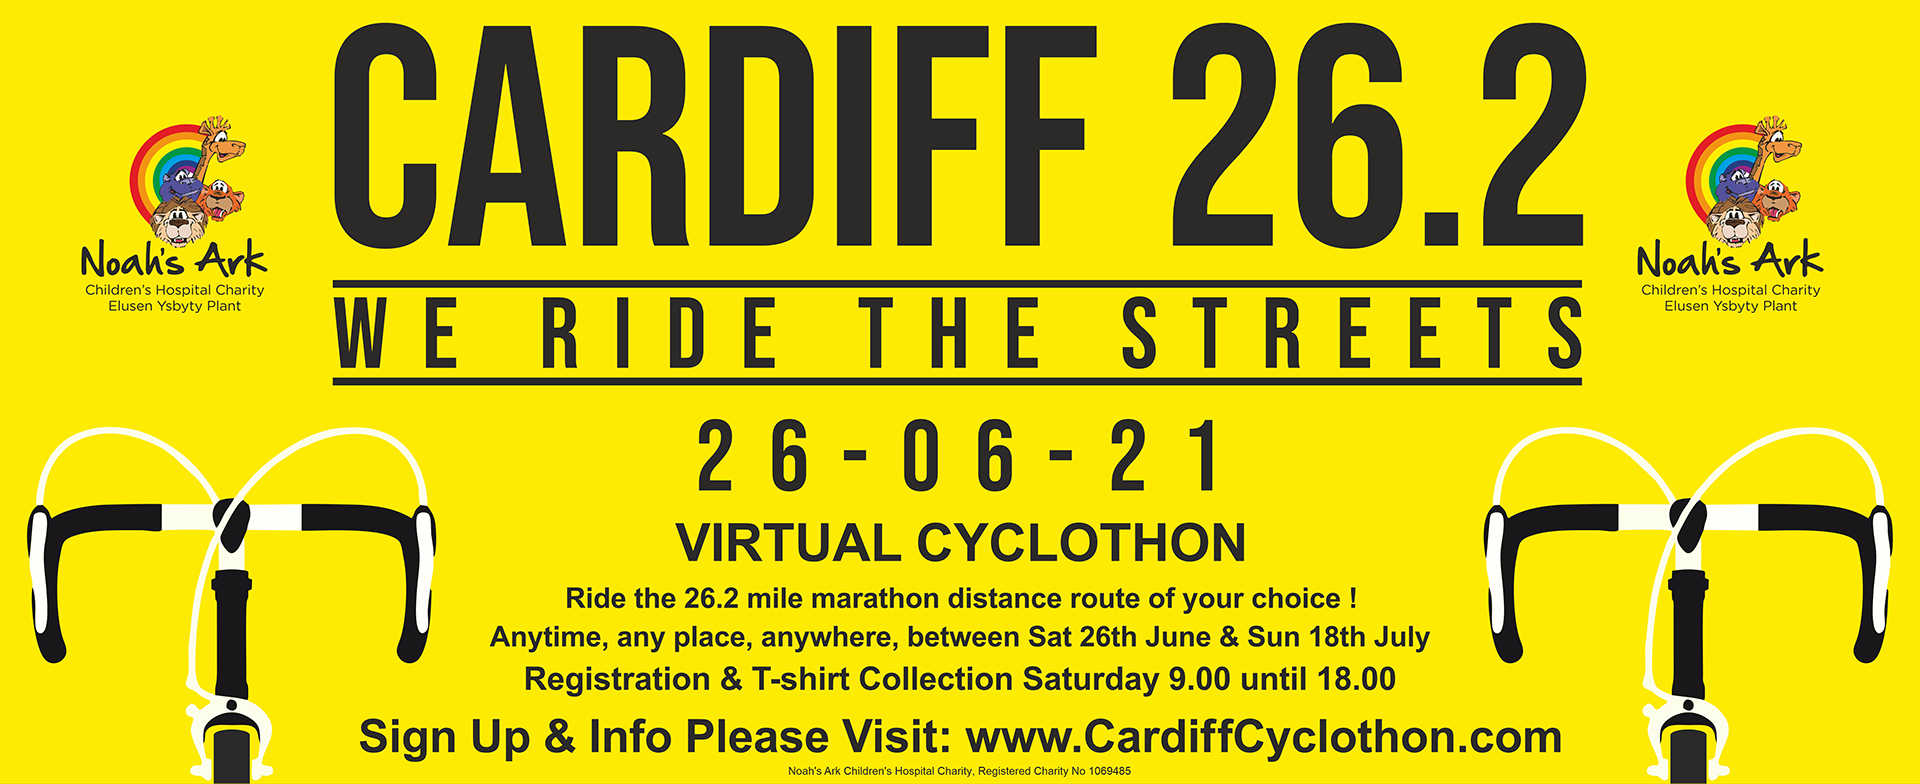 Cardiff Cyclothon Logo